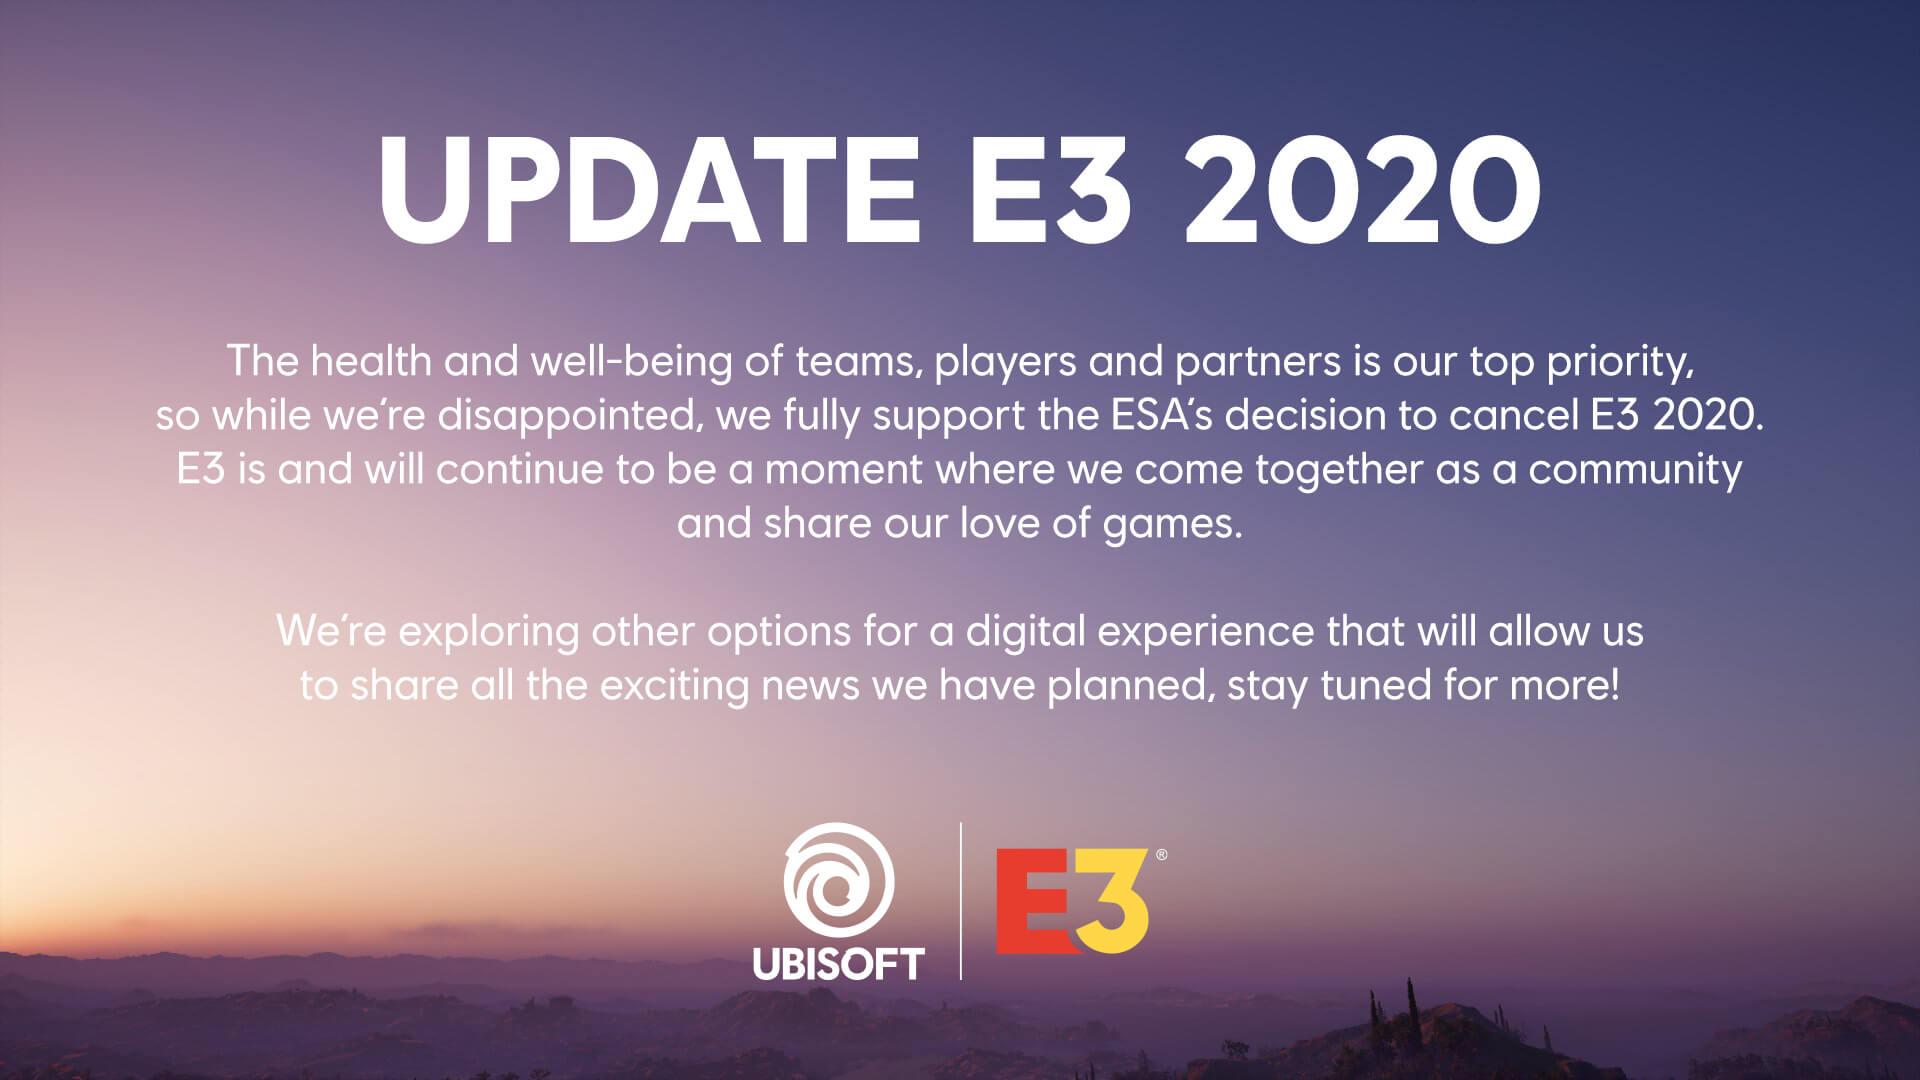 Ubisoft Update E3 2020